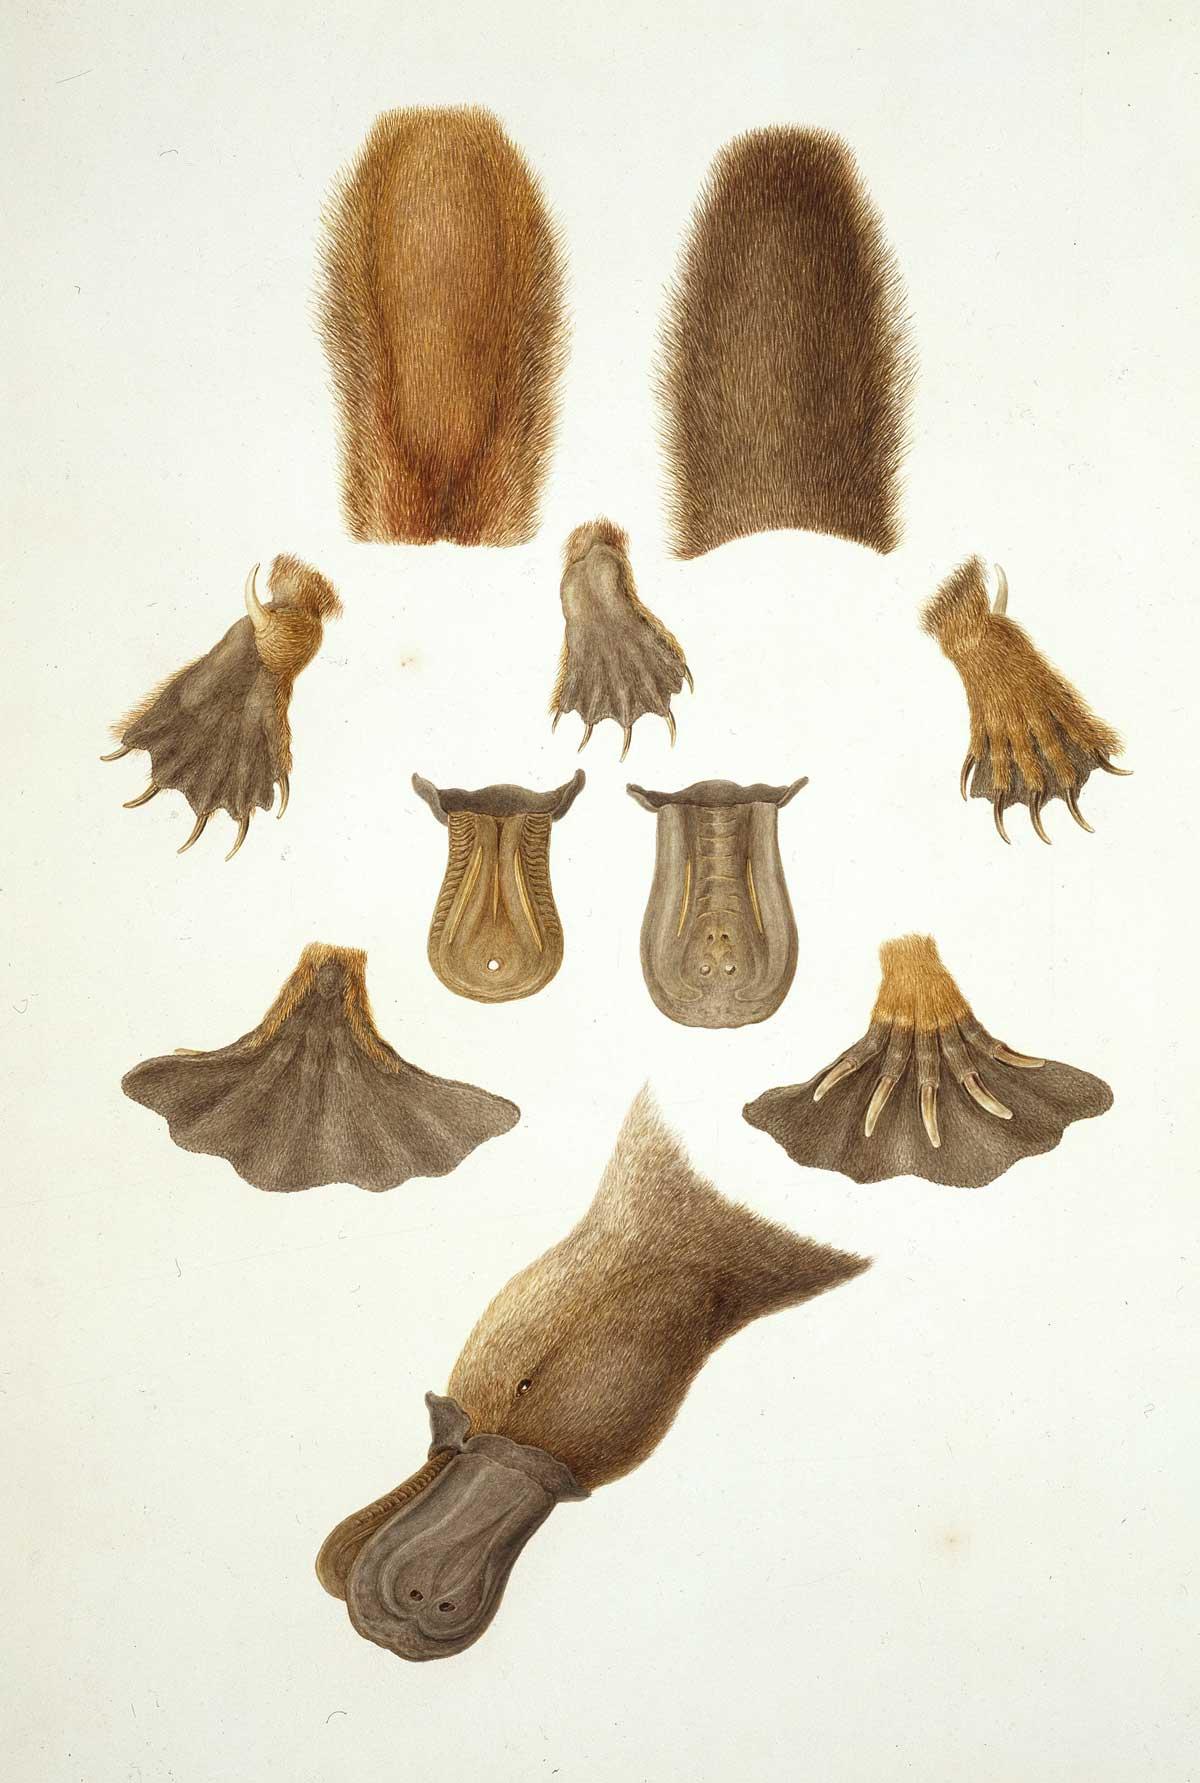 Ornithorhynchus anatinus. 19th-century coloured engraving. Alamy.